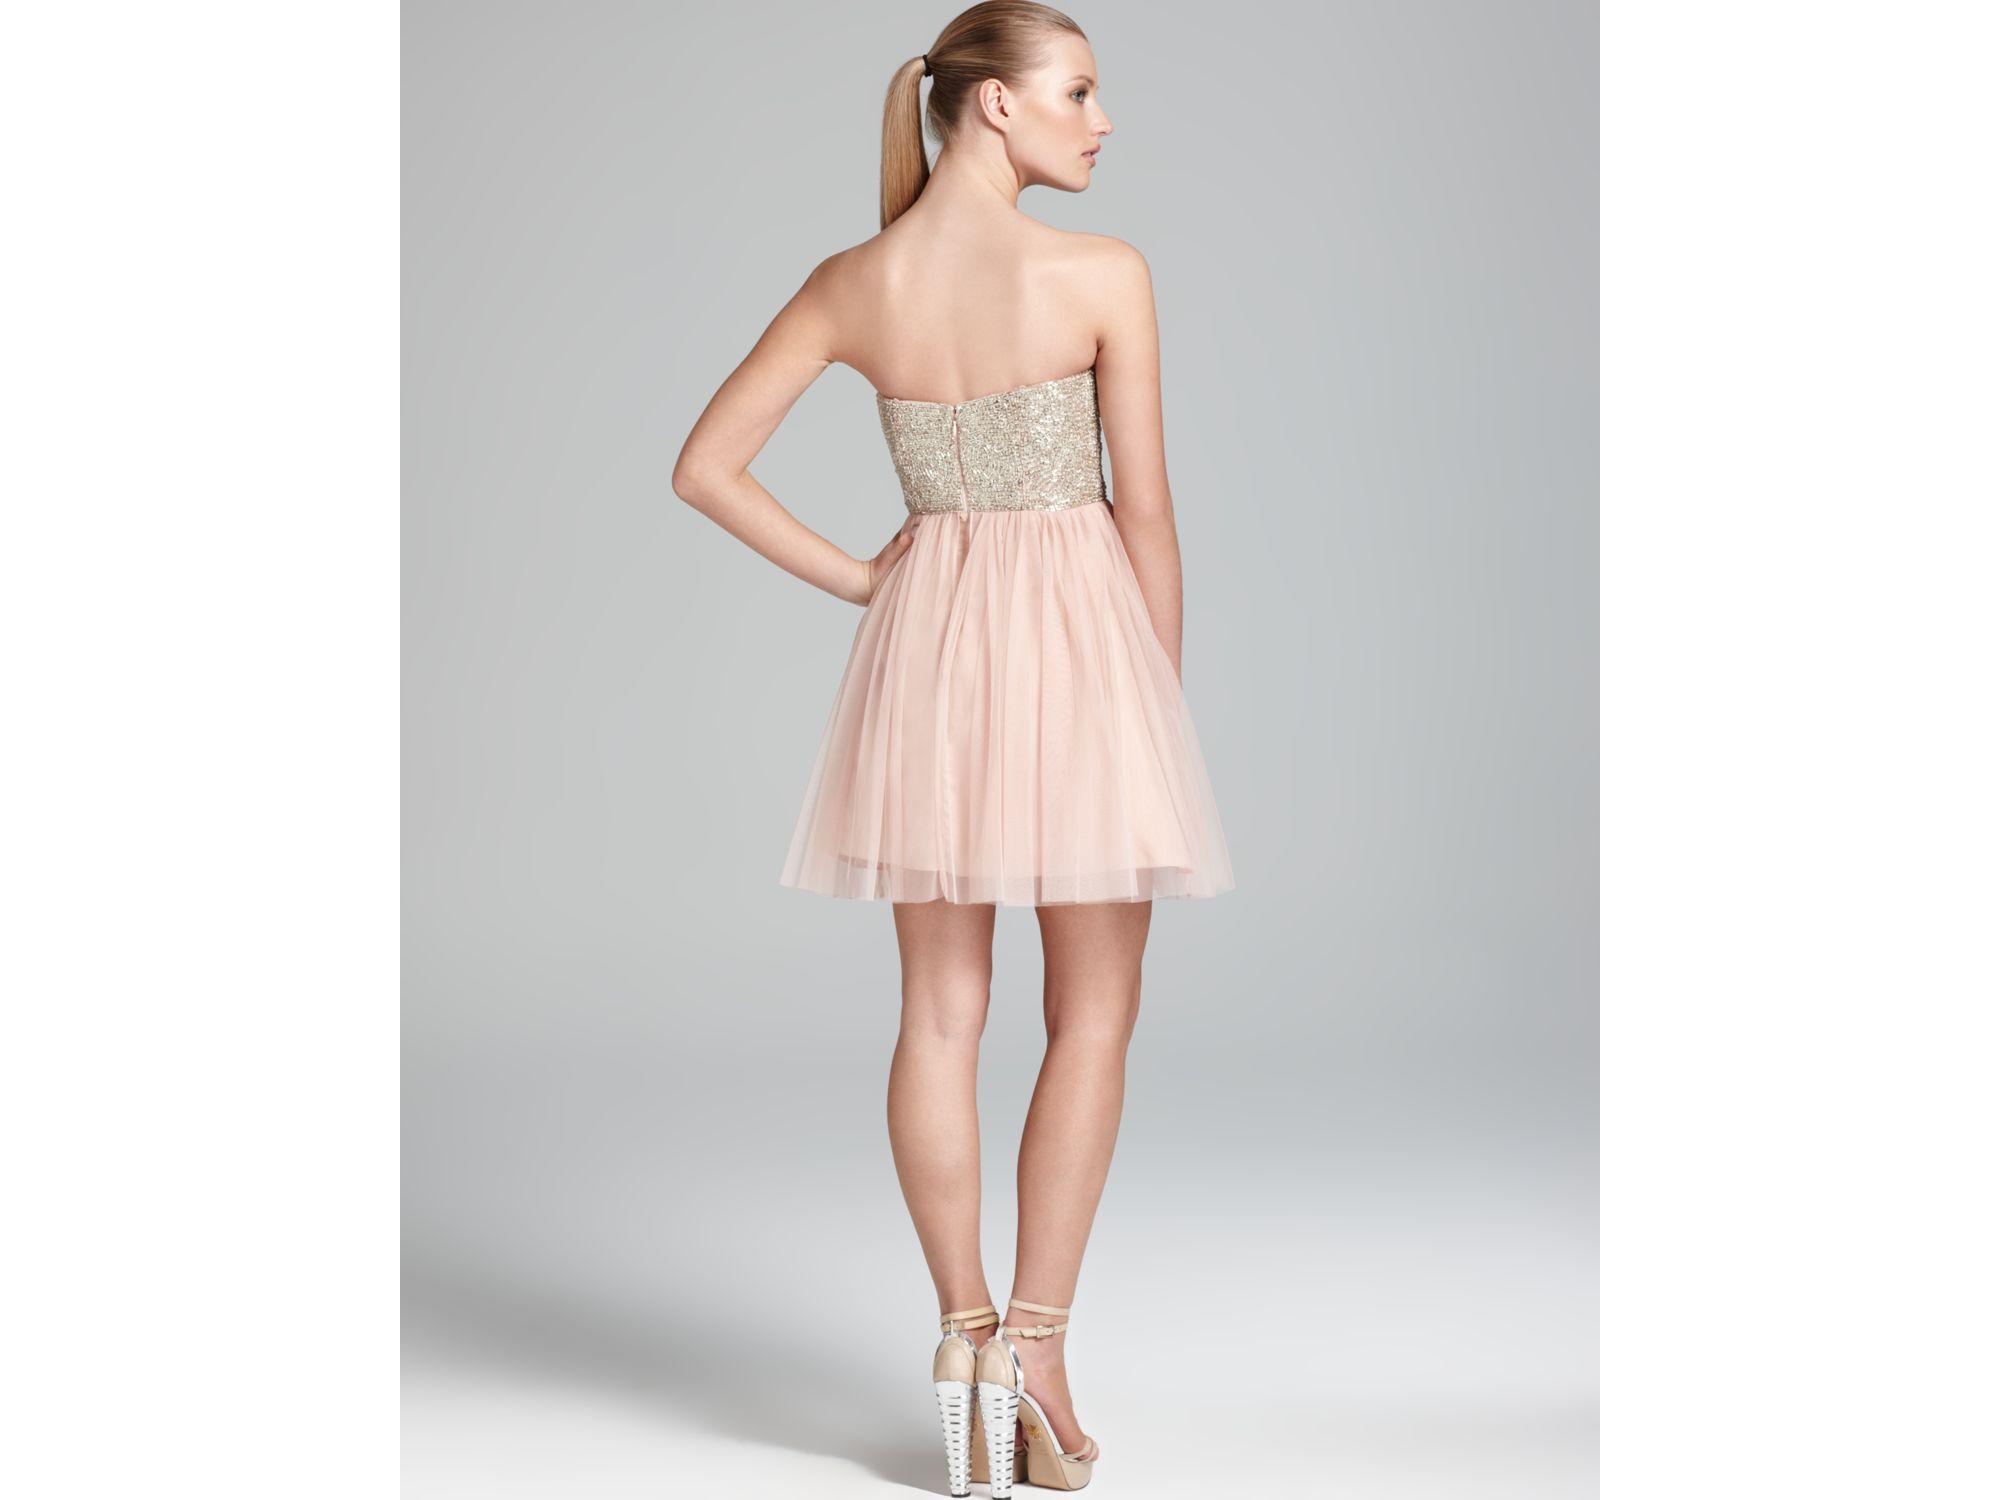 Aidan mattox Party Dress Strapless Sequin Top in Pink | Lyst